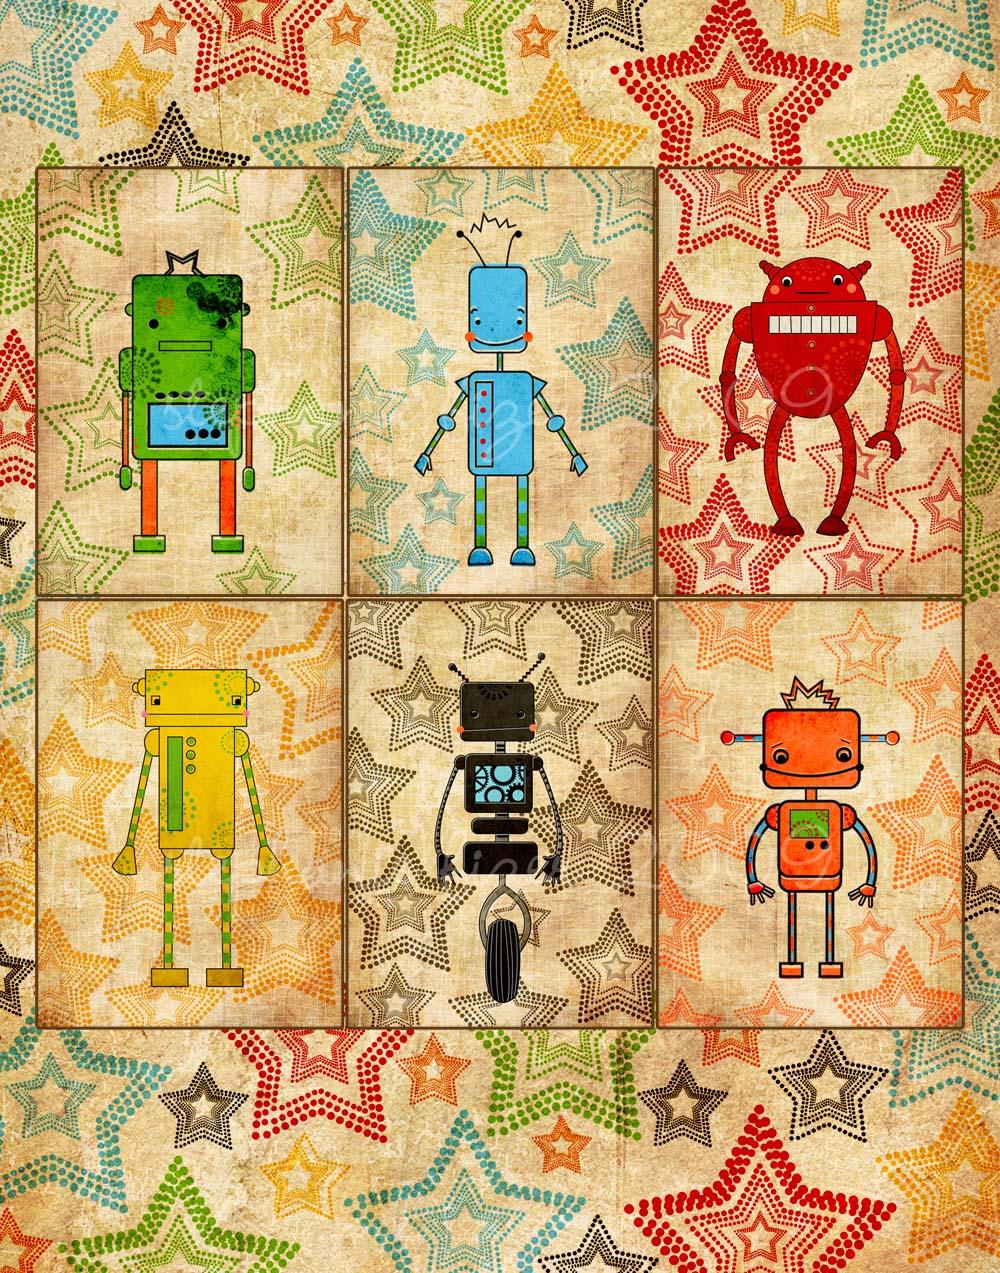 Robot Six